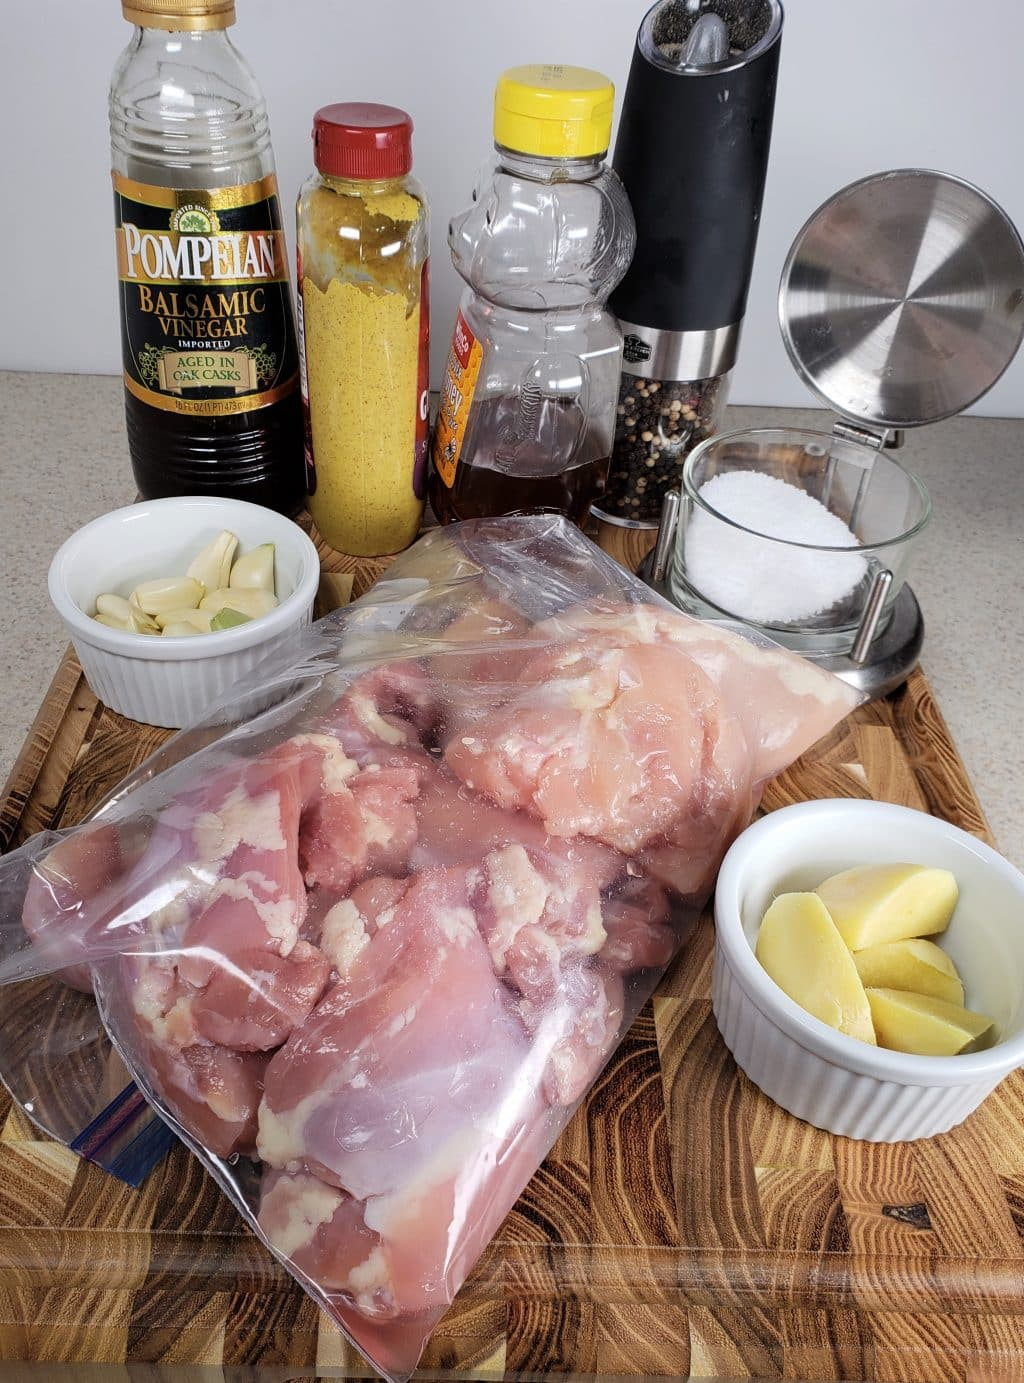 Cast of Ingredients for Pressure Cooker Balsamic Ginger Chicken